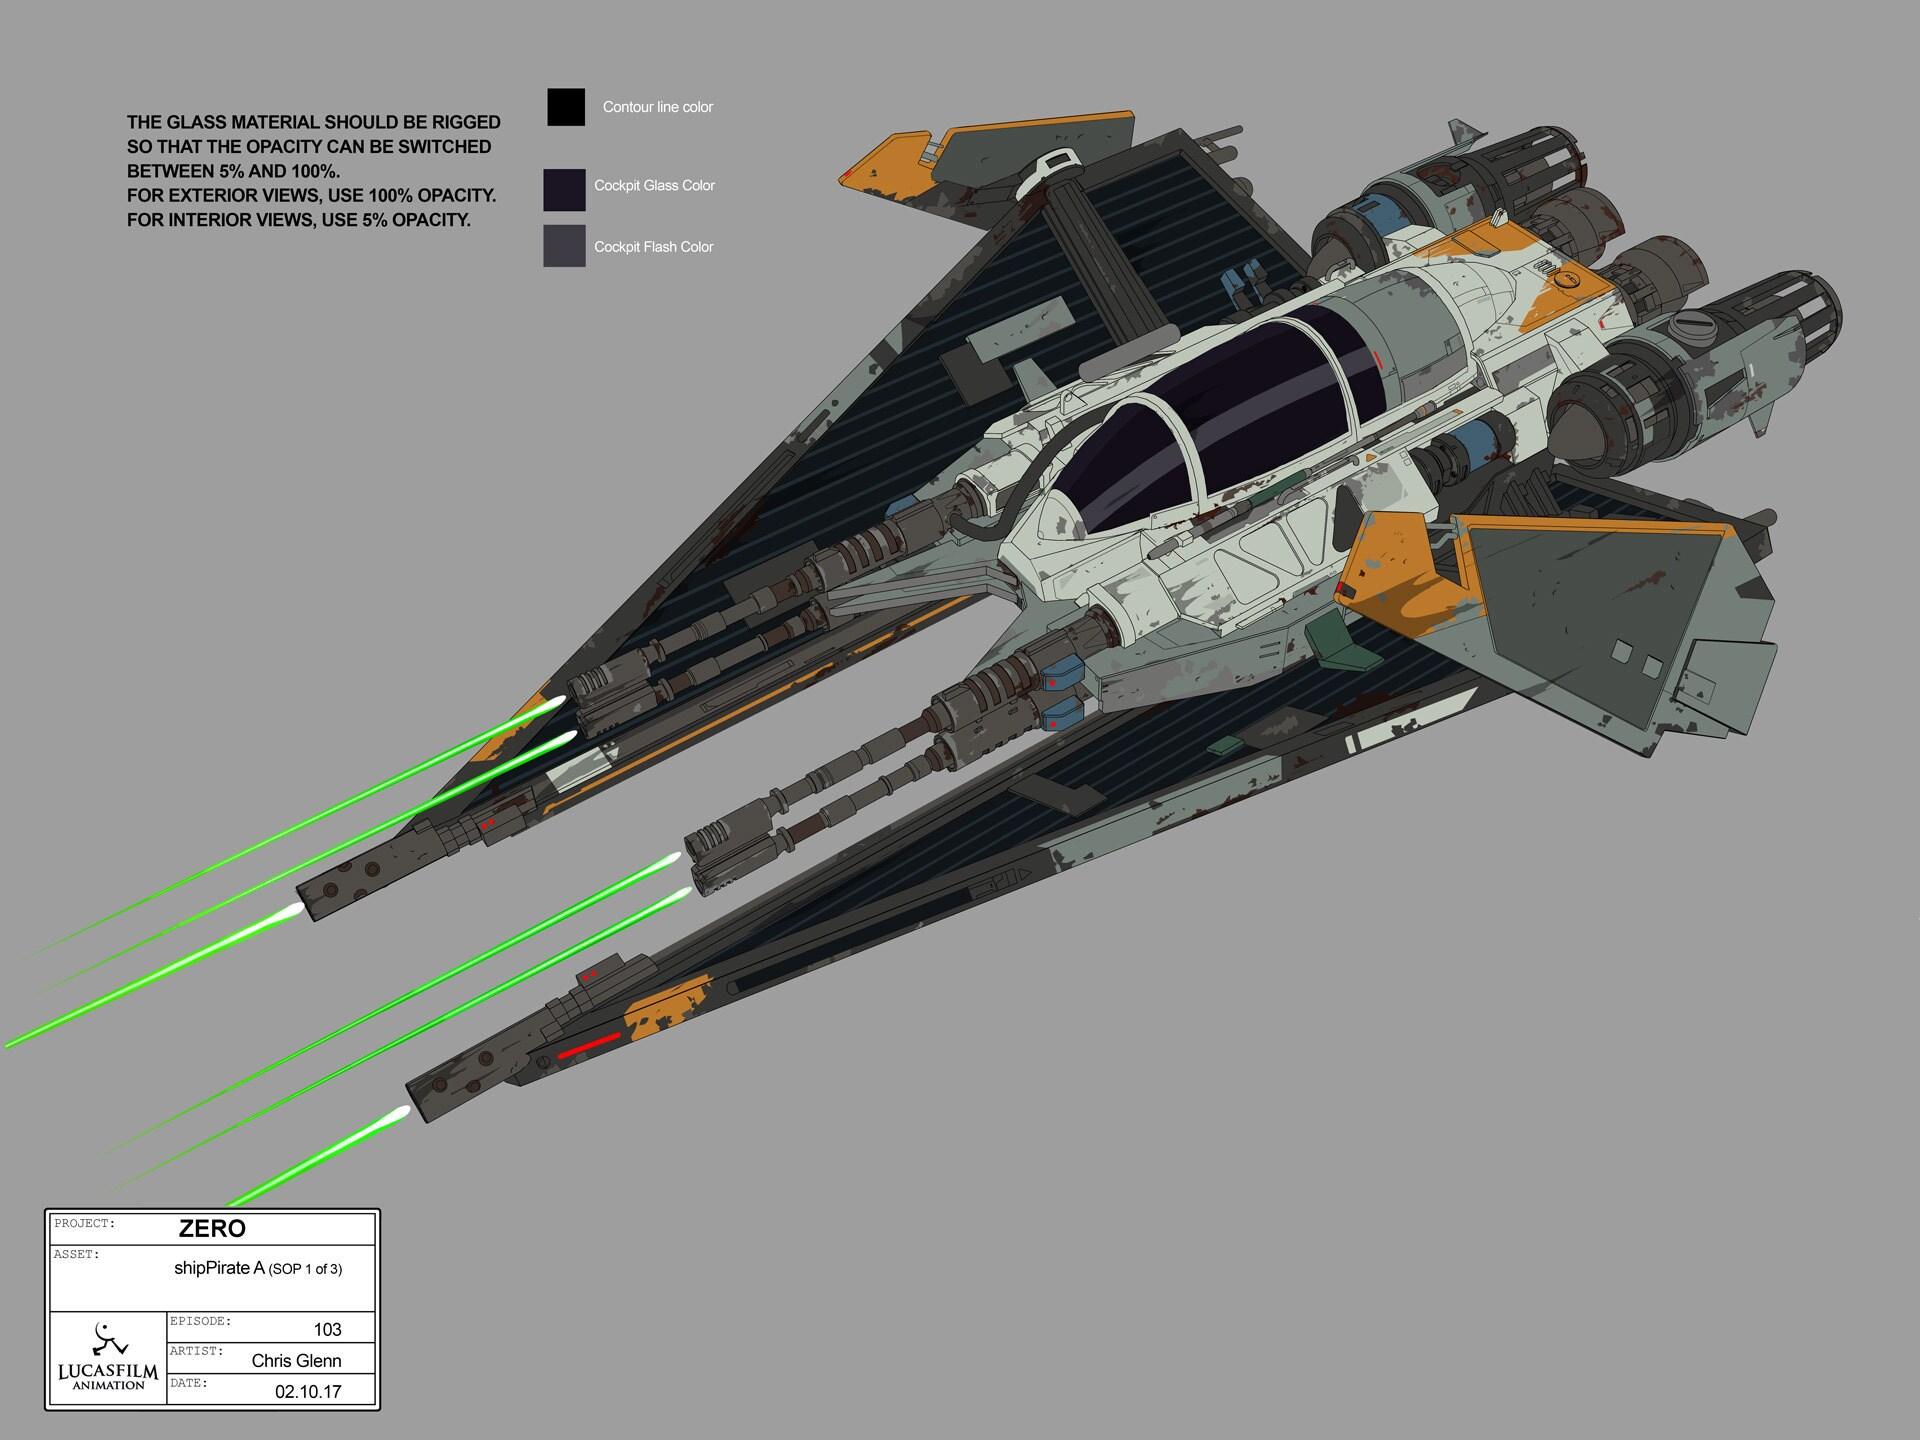 resistance-db-triple-dark-concept-art-3_bdeb6727.jpeg?region=0%2C0%2C1920%2C1440